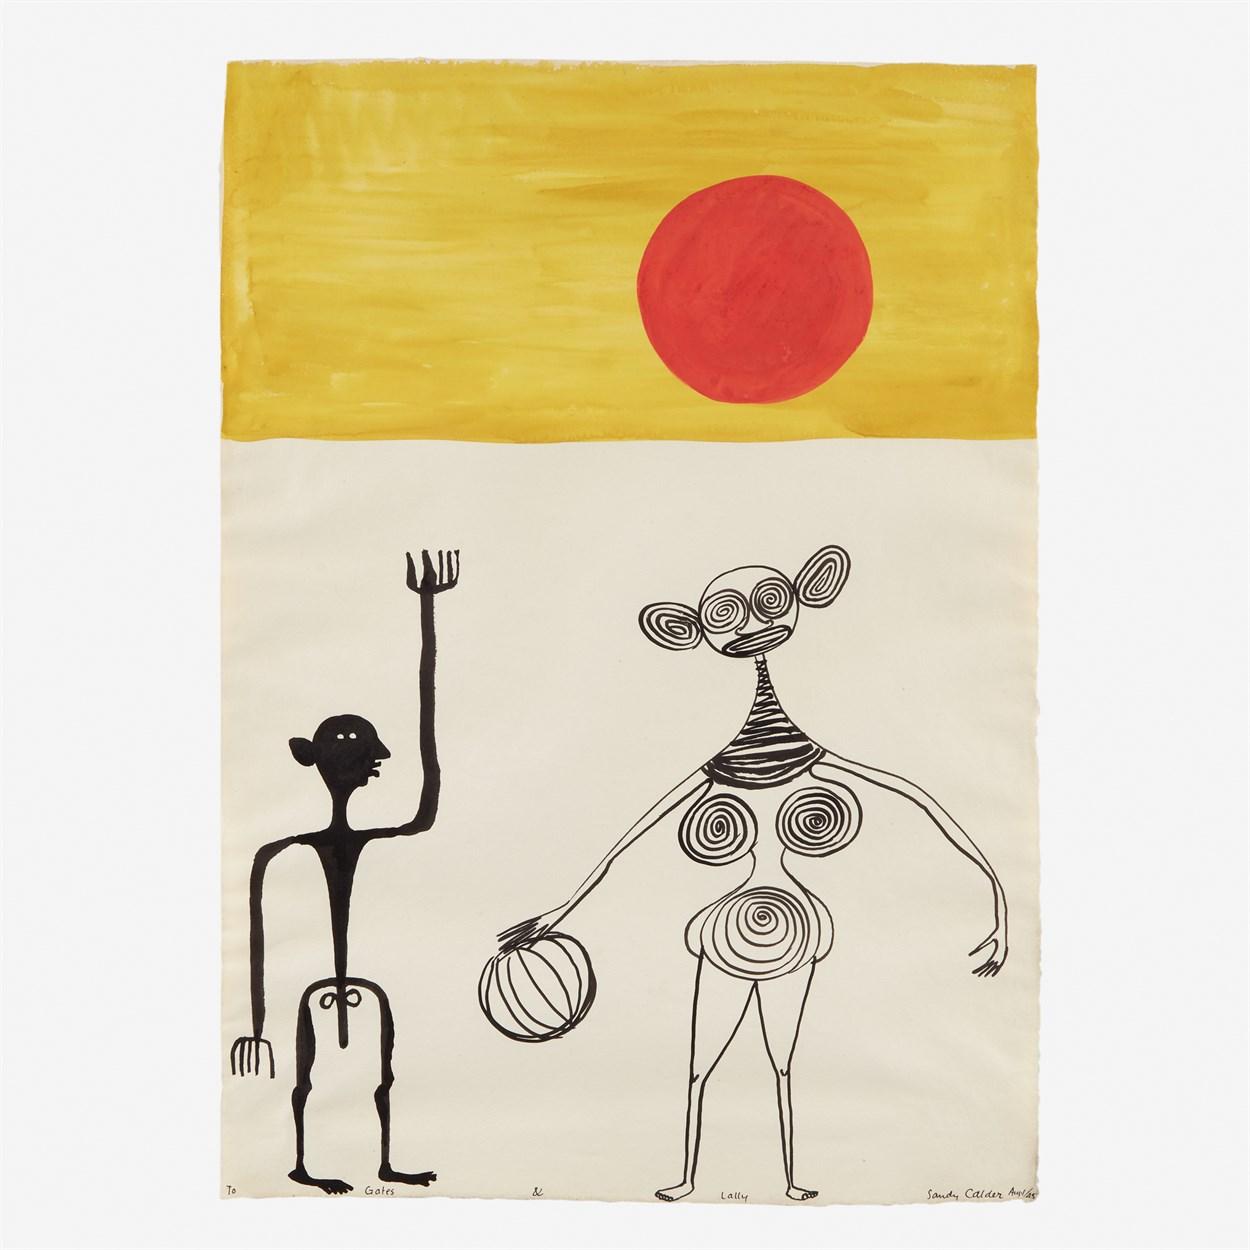 Lot 47 - Alexander Calder (American, 1898-1976)